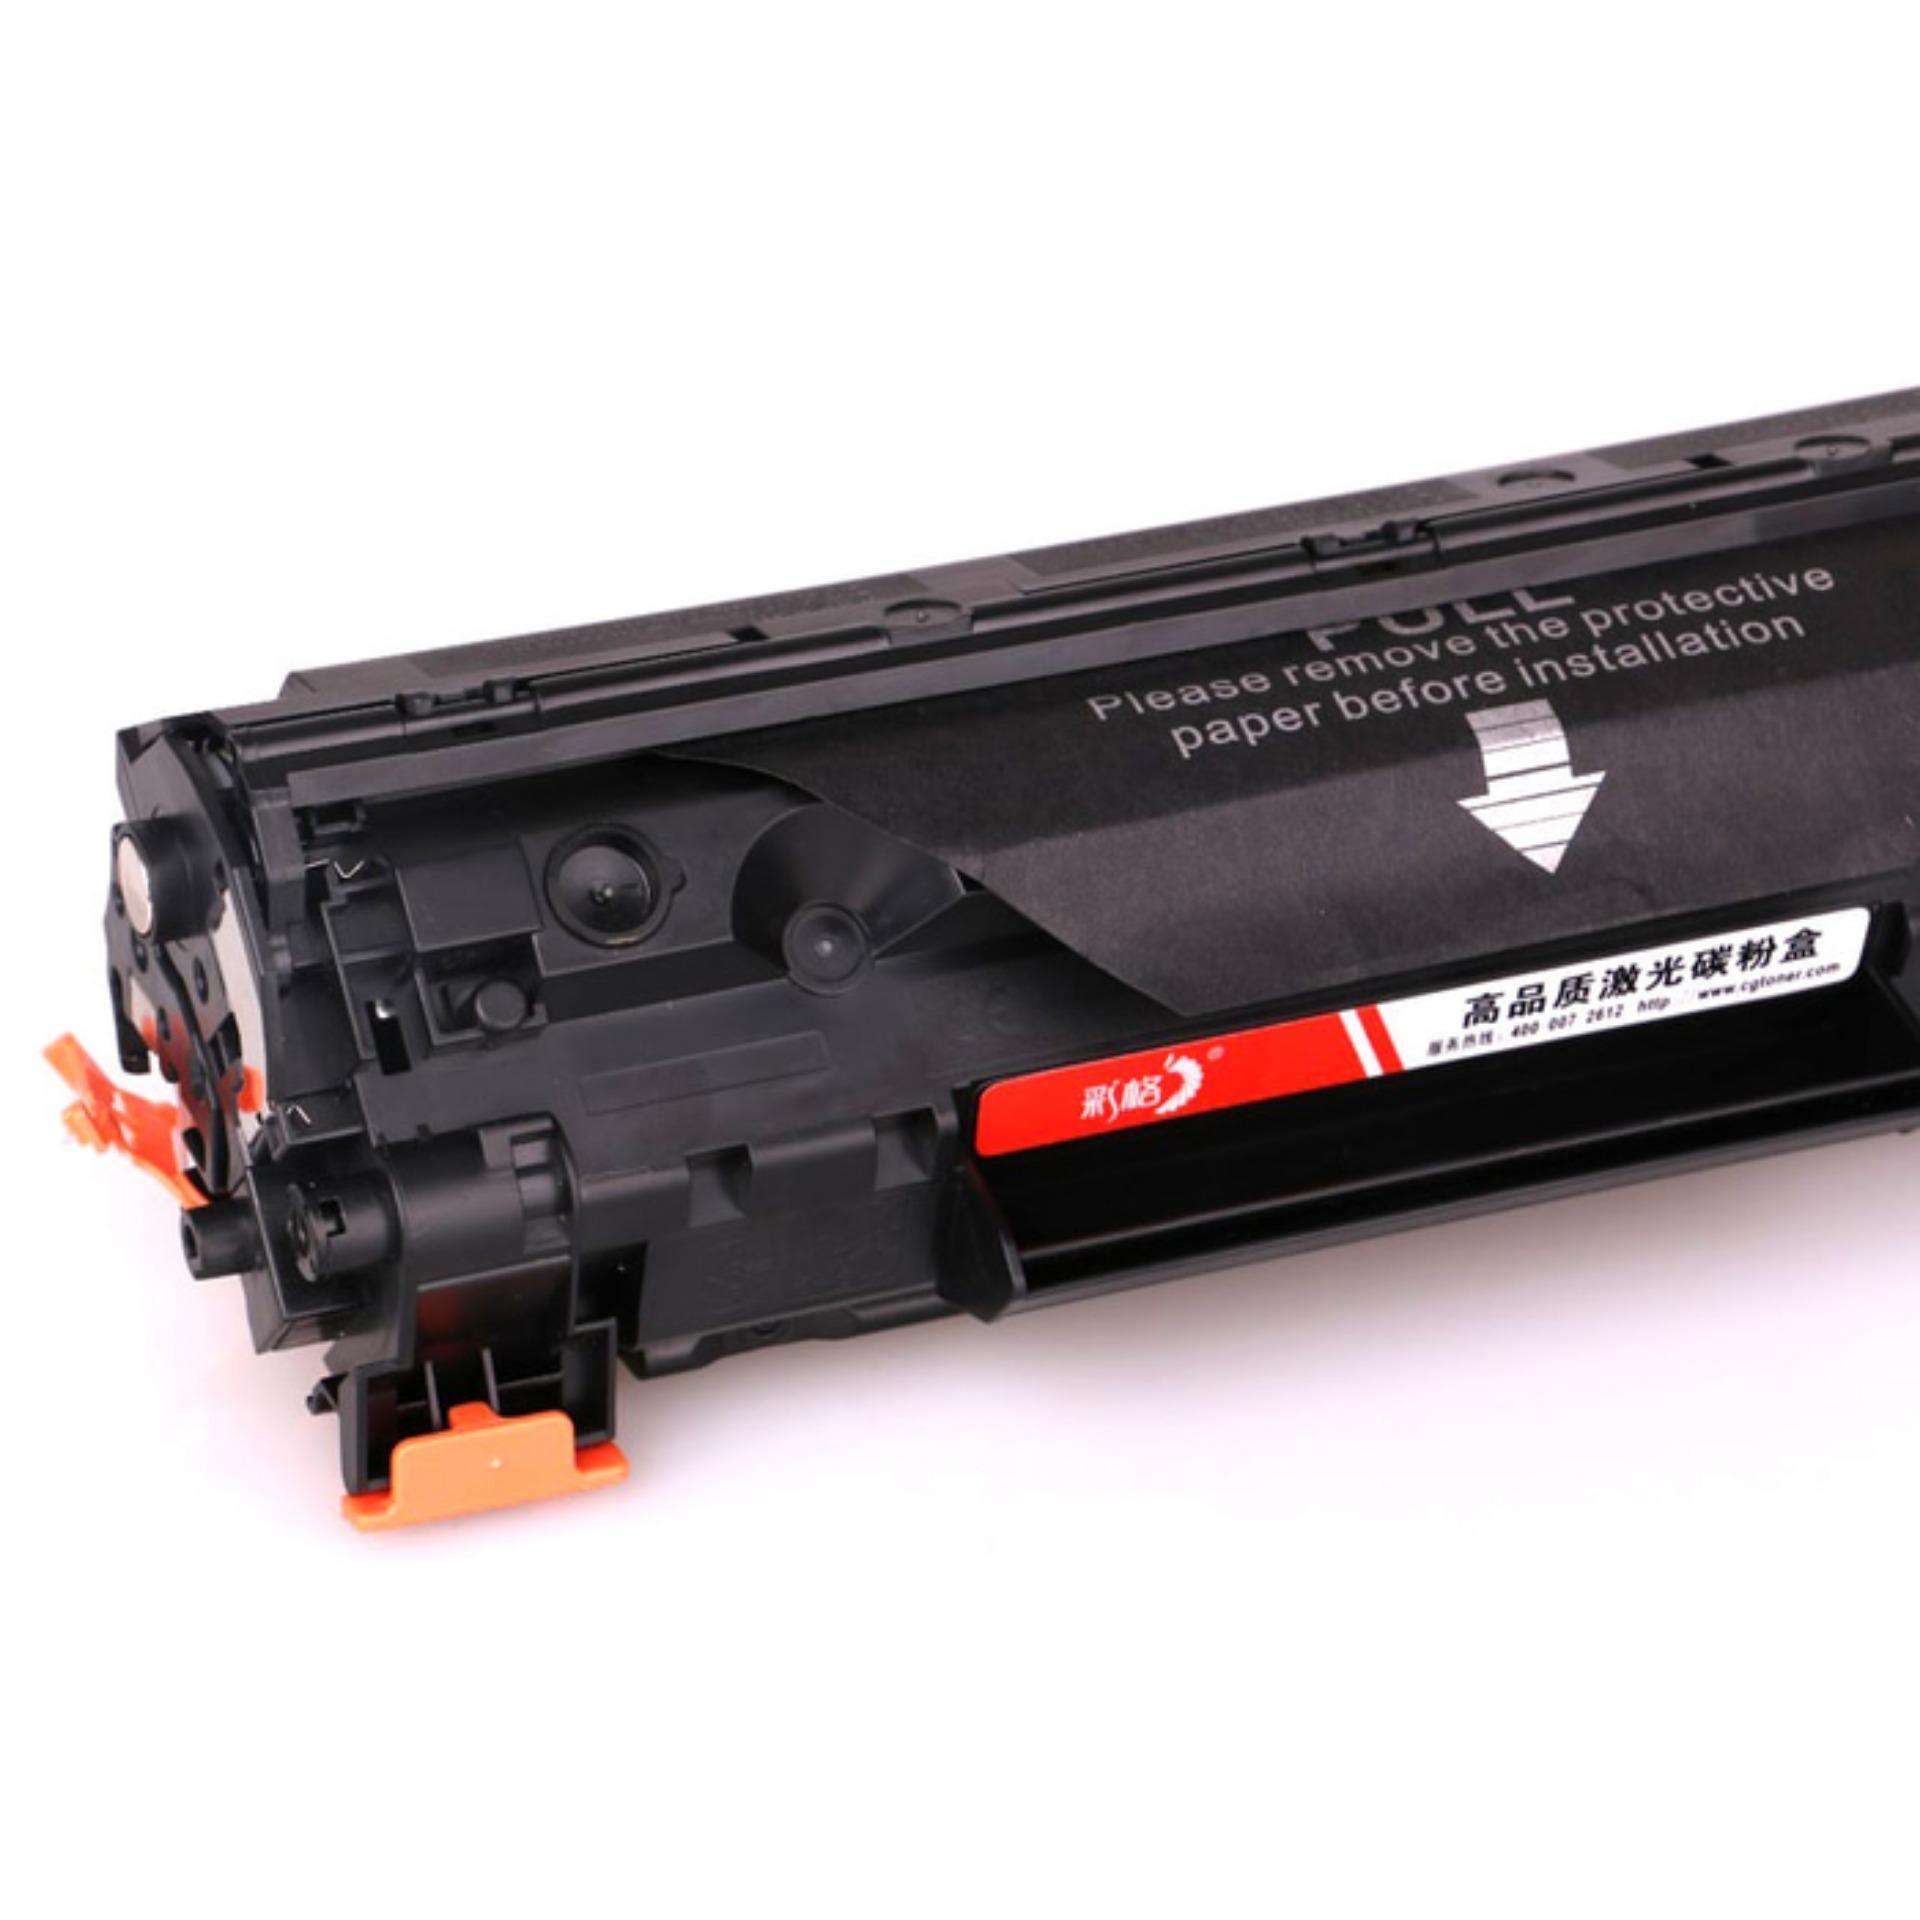 Replacement Printer Toner HP CRG-725 CRG-325 CE285A & Canon .